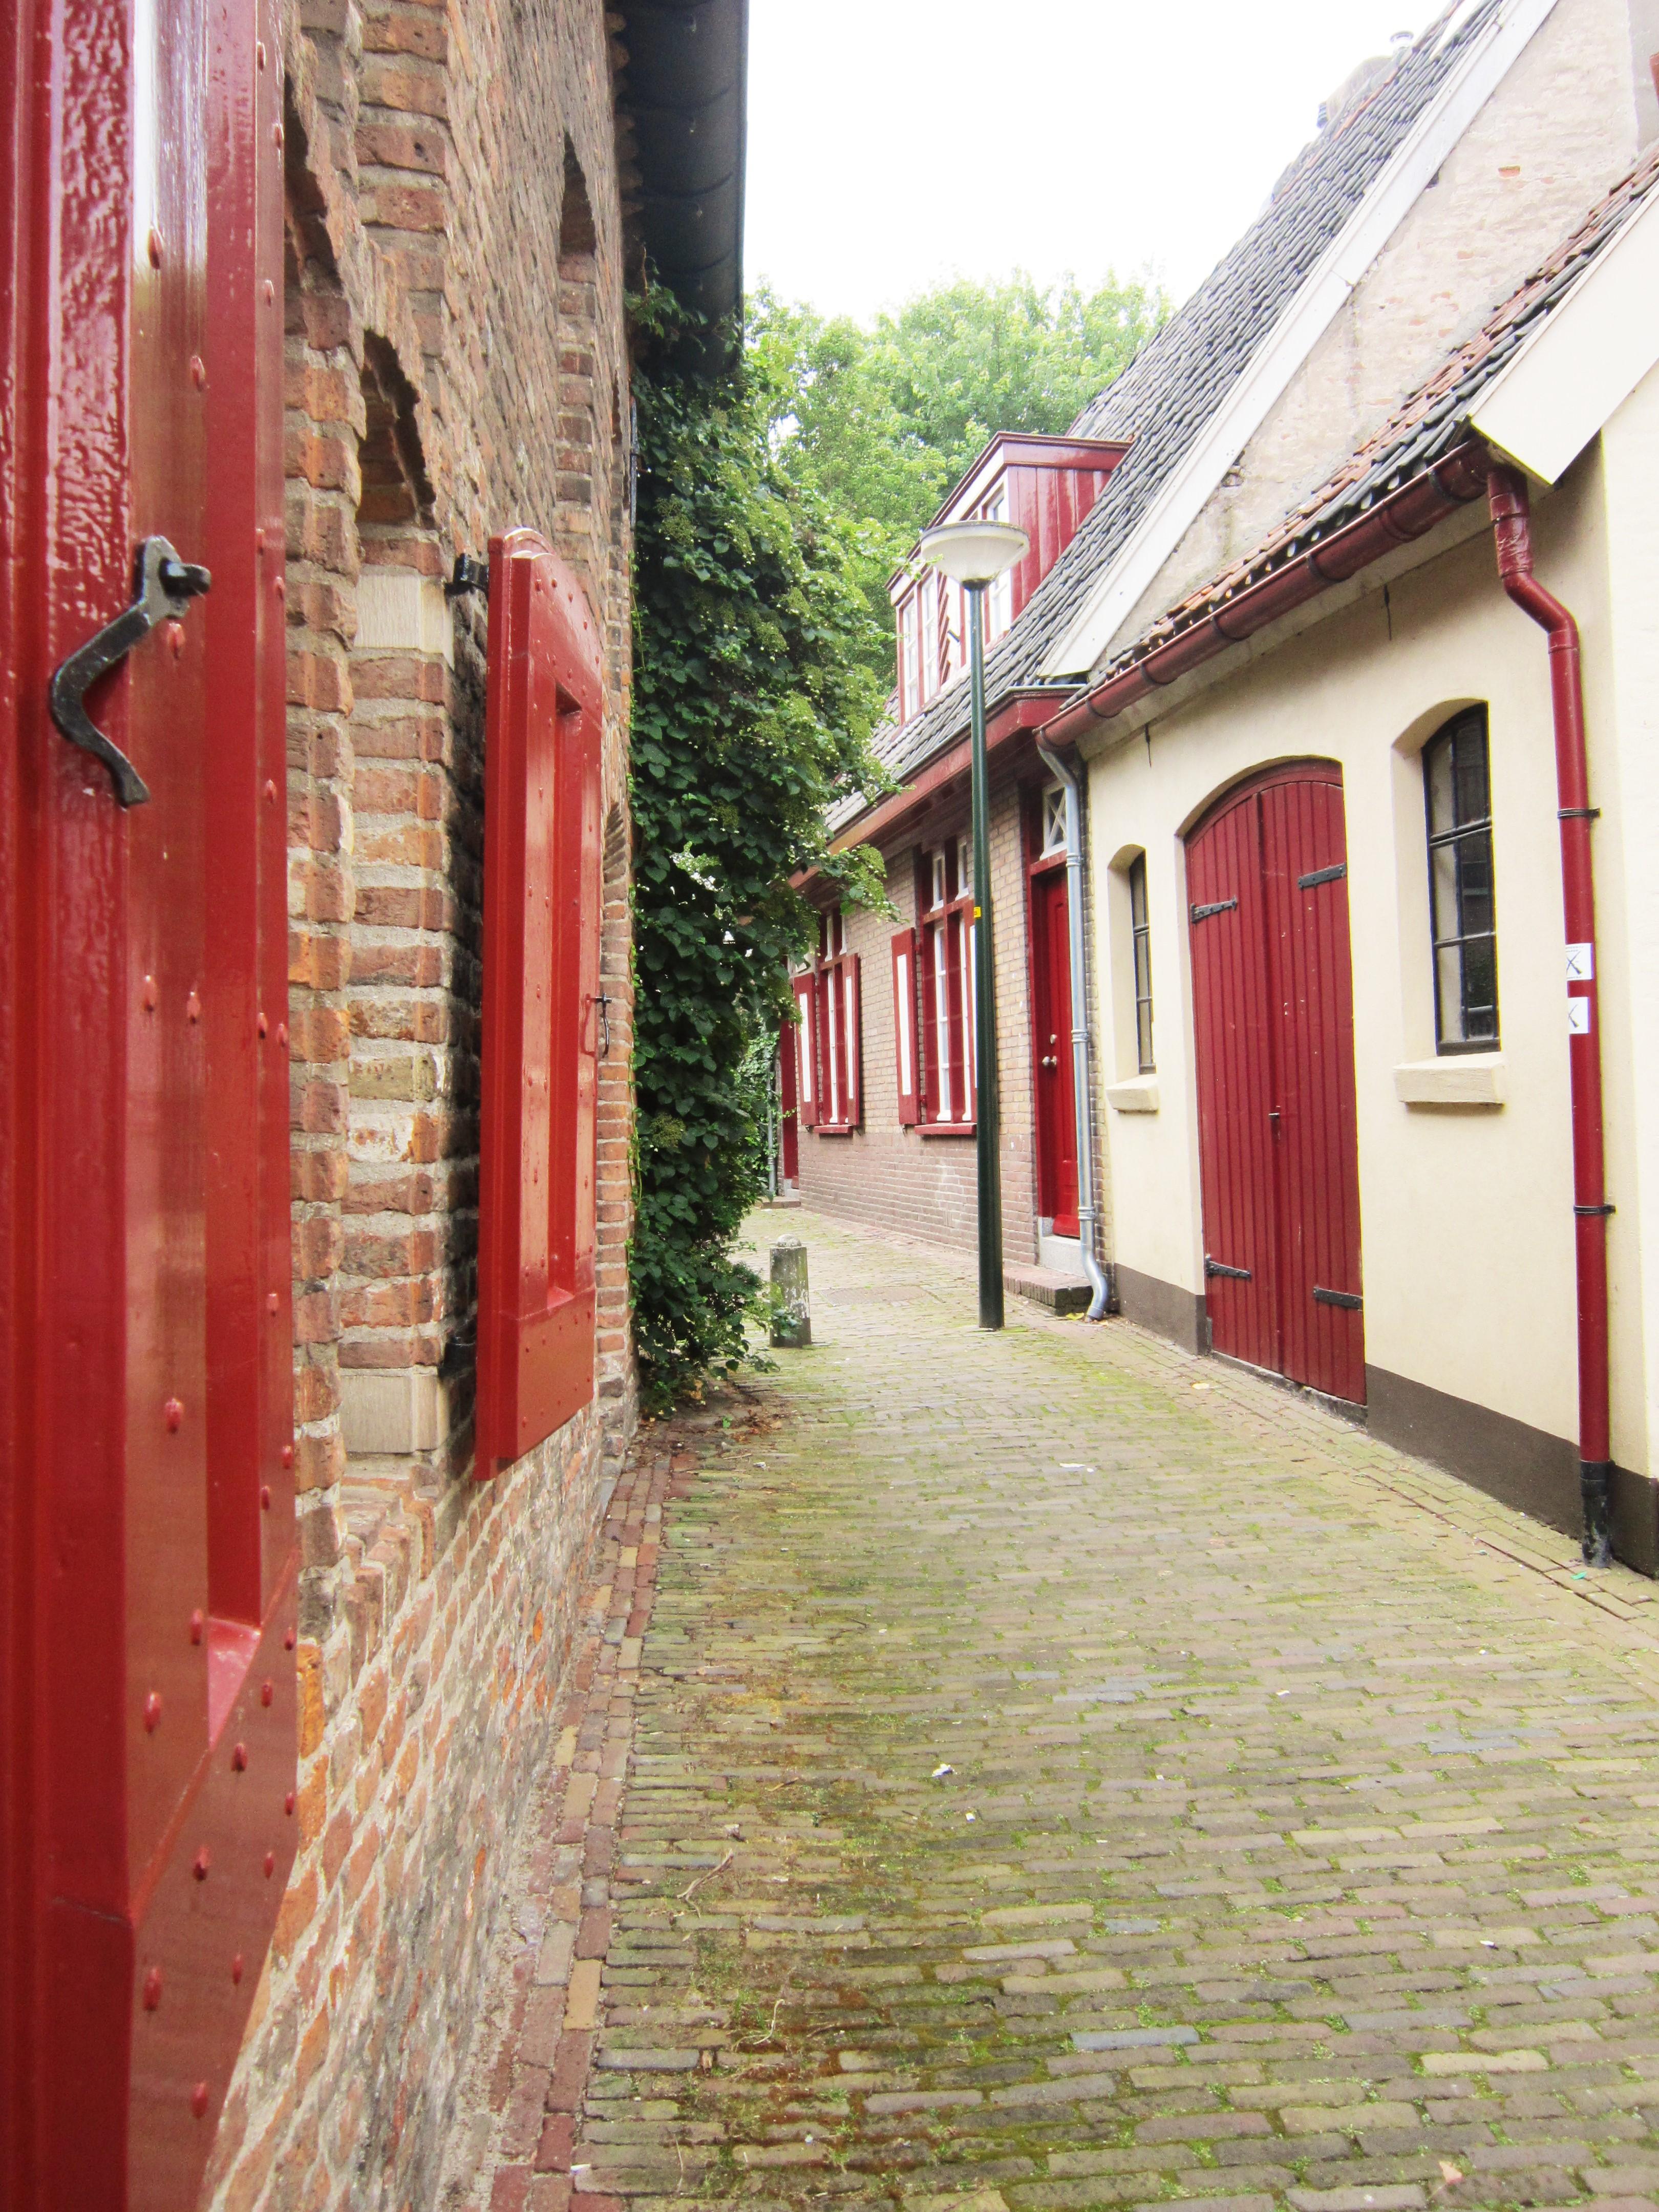 Doesburg bezienswaardigheden stedentrip Nederland dagje weg dagje uit kerk architectuur middeleeuws Hanzestad